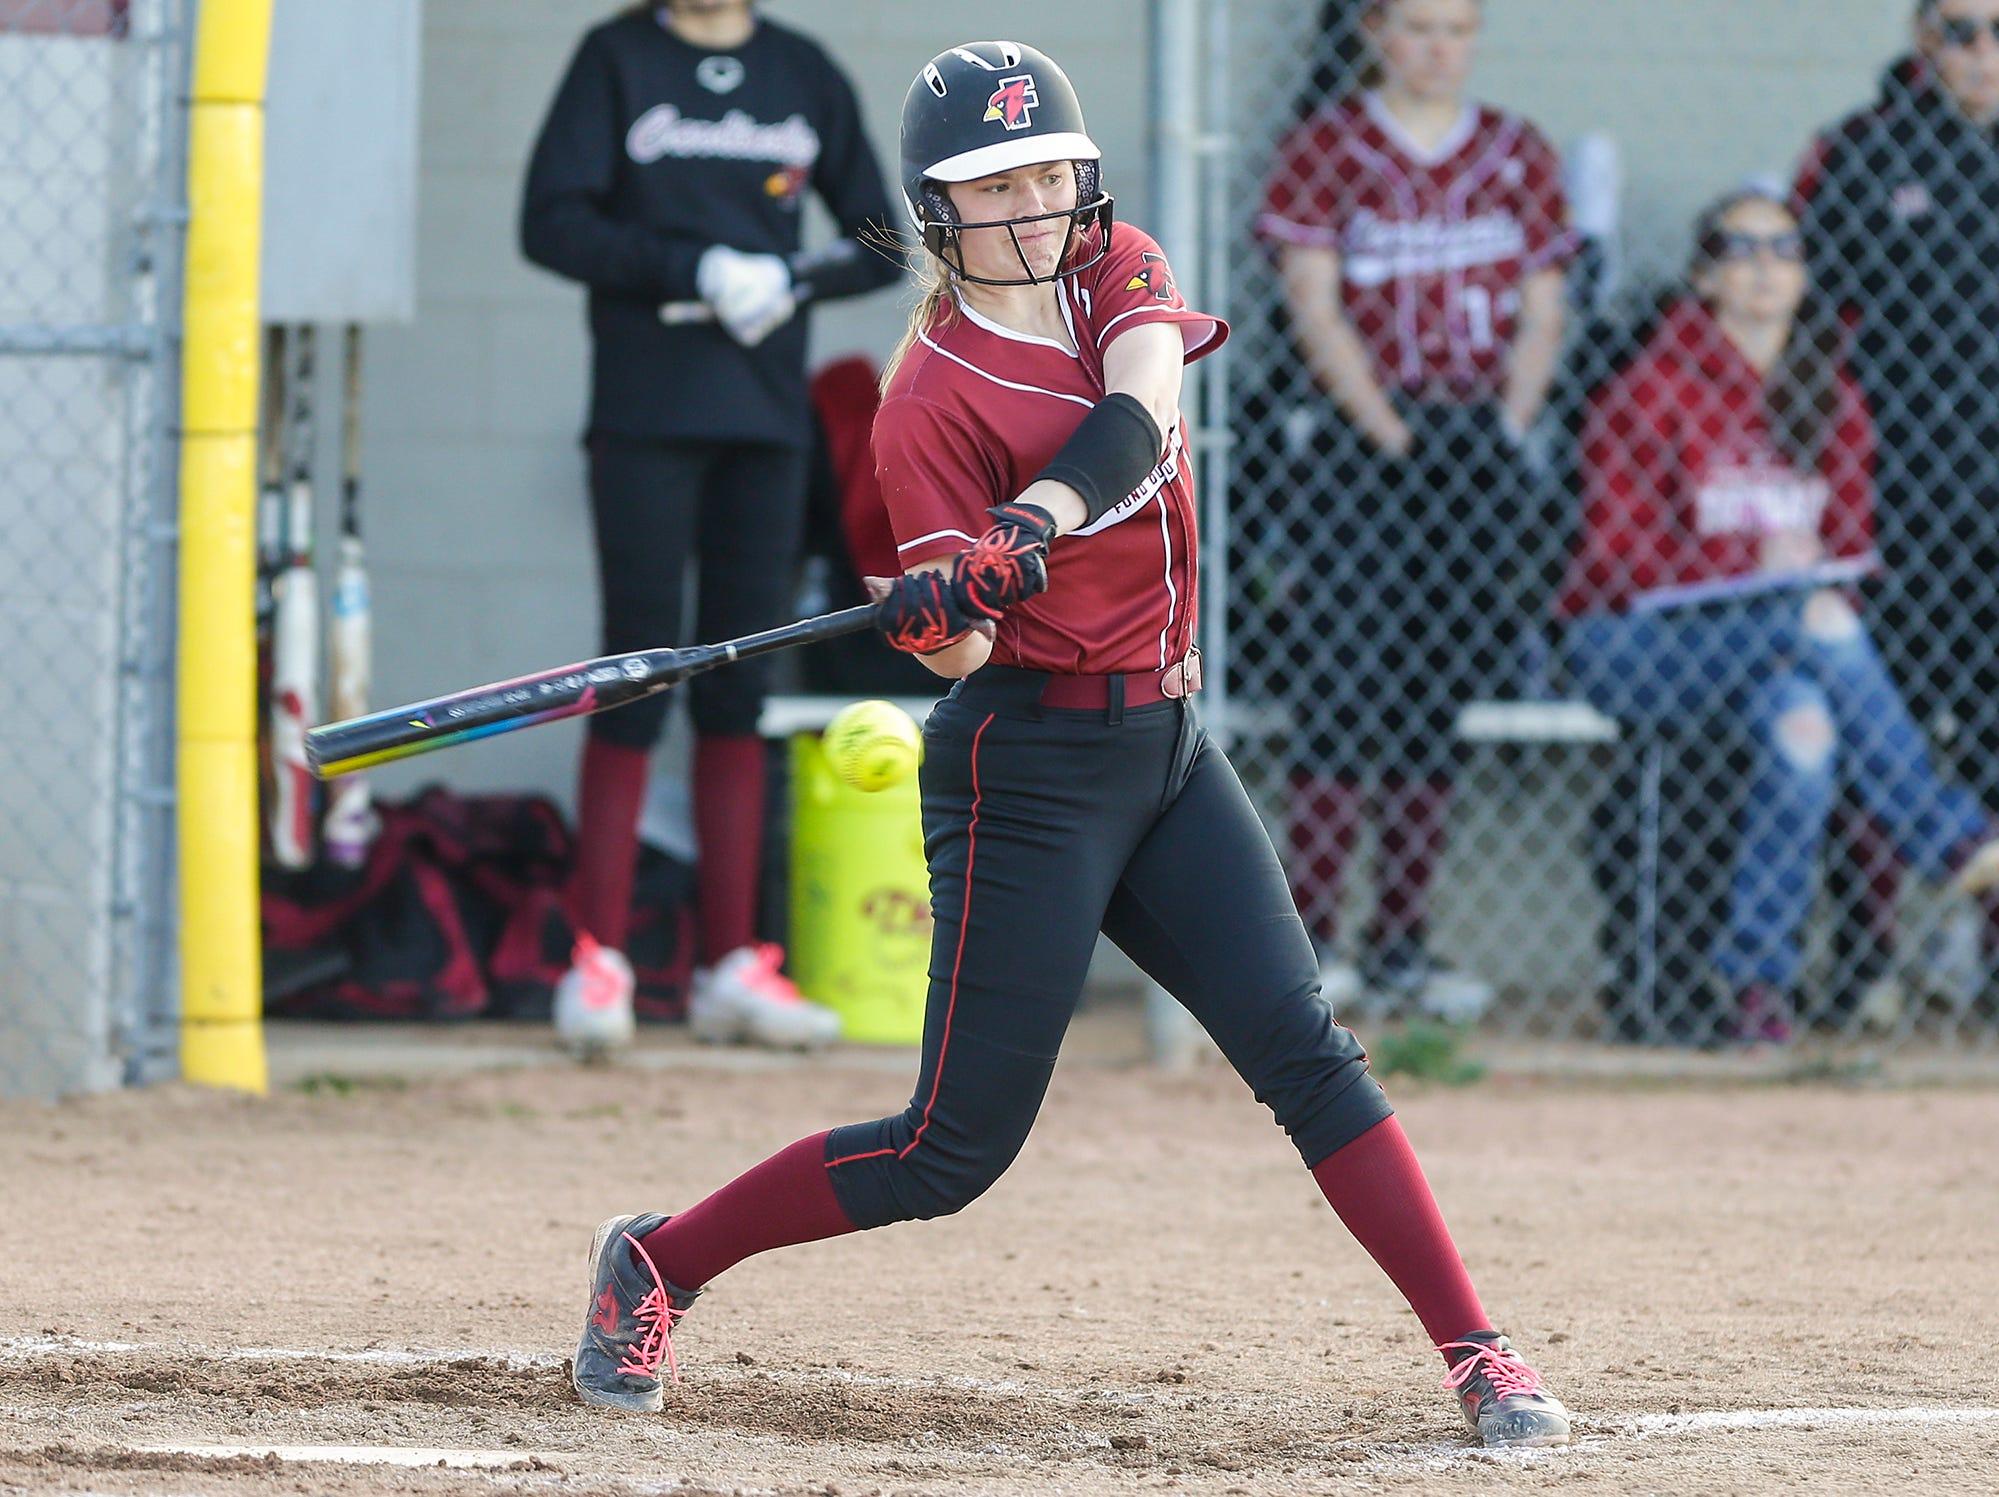 Fond du Lac High School softball's Morgan Flaherty hits a run scoring single against Oshkosh North High School during their game Friday, April 26, 2019 in Fond du Lac, Wis. Doug Raflik/USA TODAY NETWORK-Wisconsin